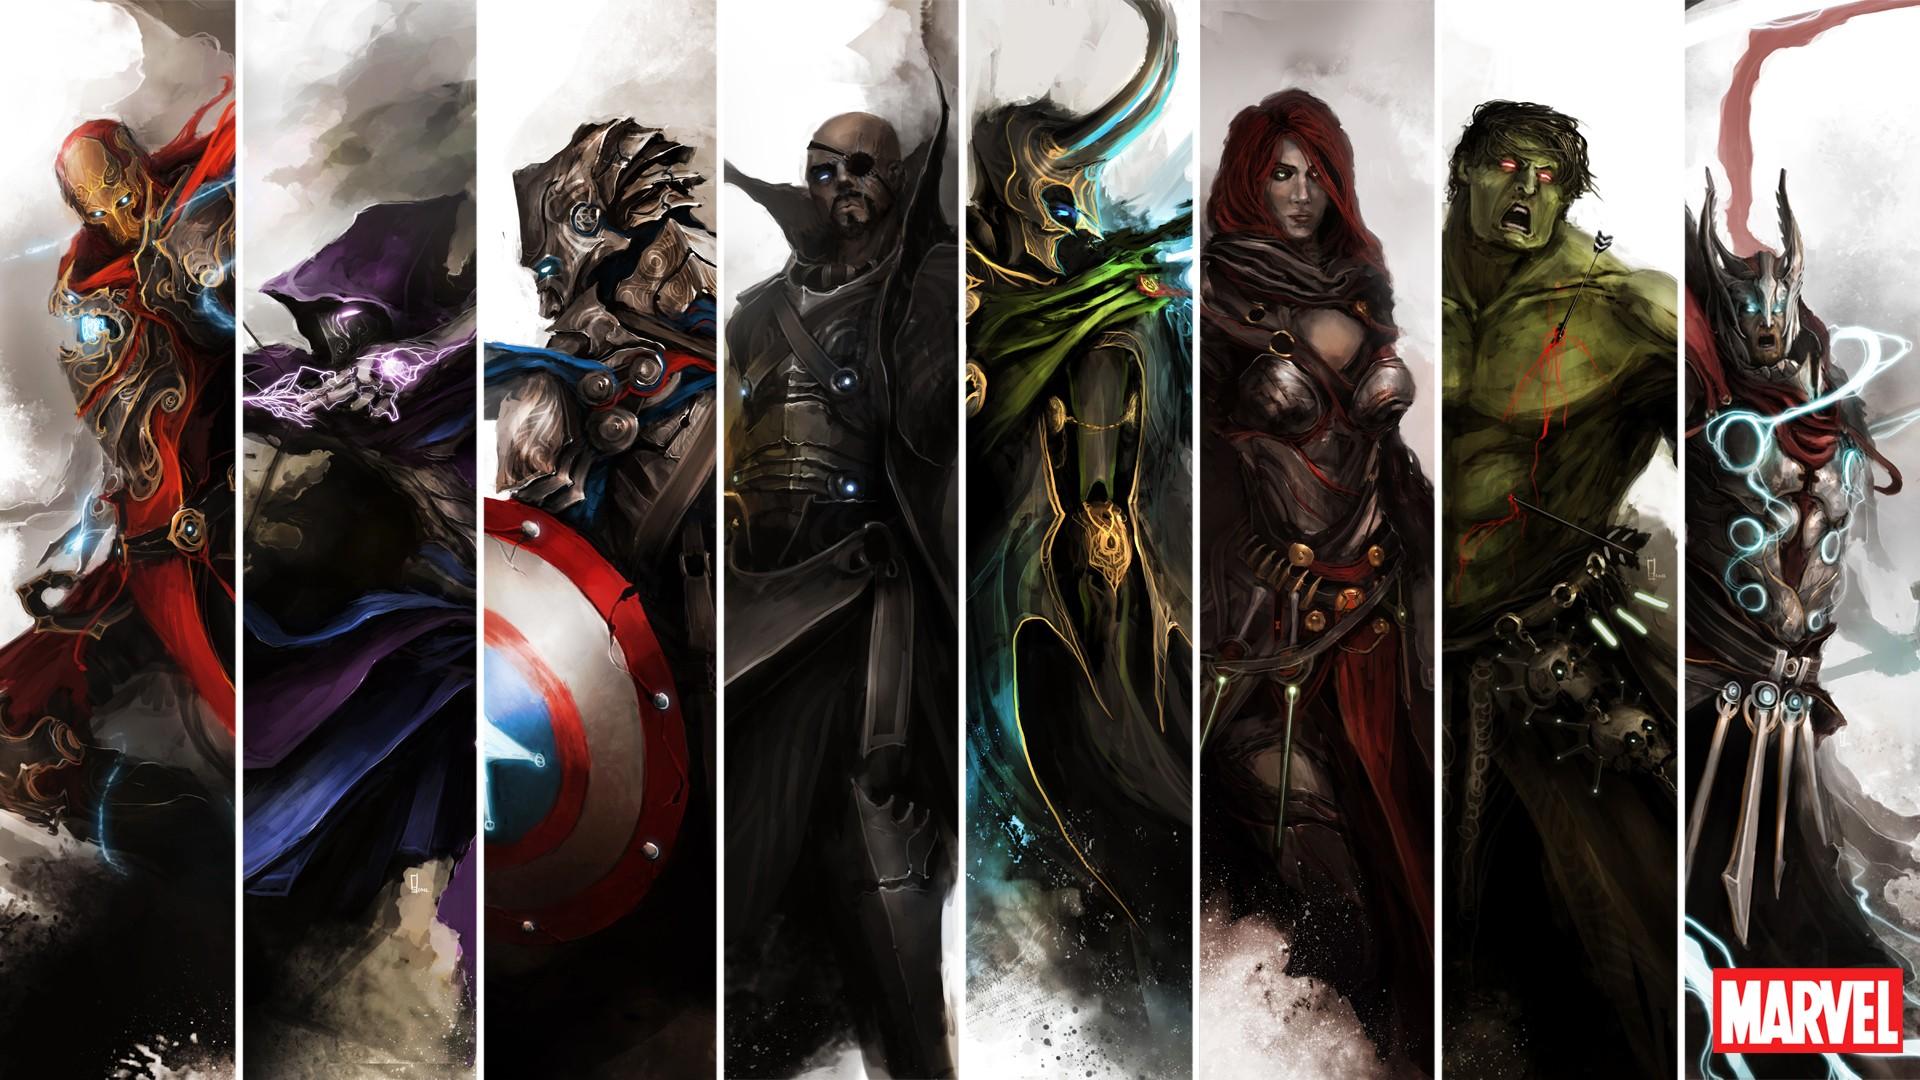 47 Marvel Hd Wallpapers 1080p On Wallpapersafari